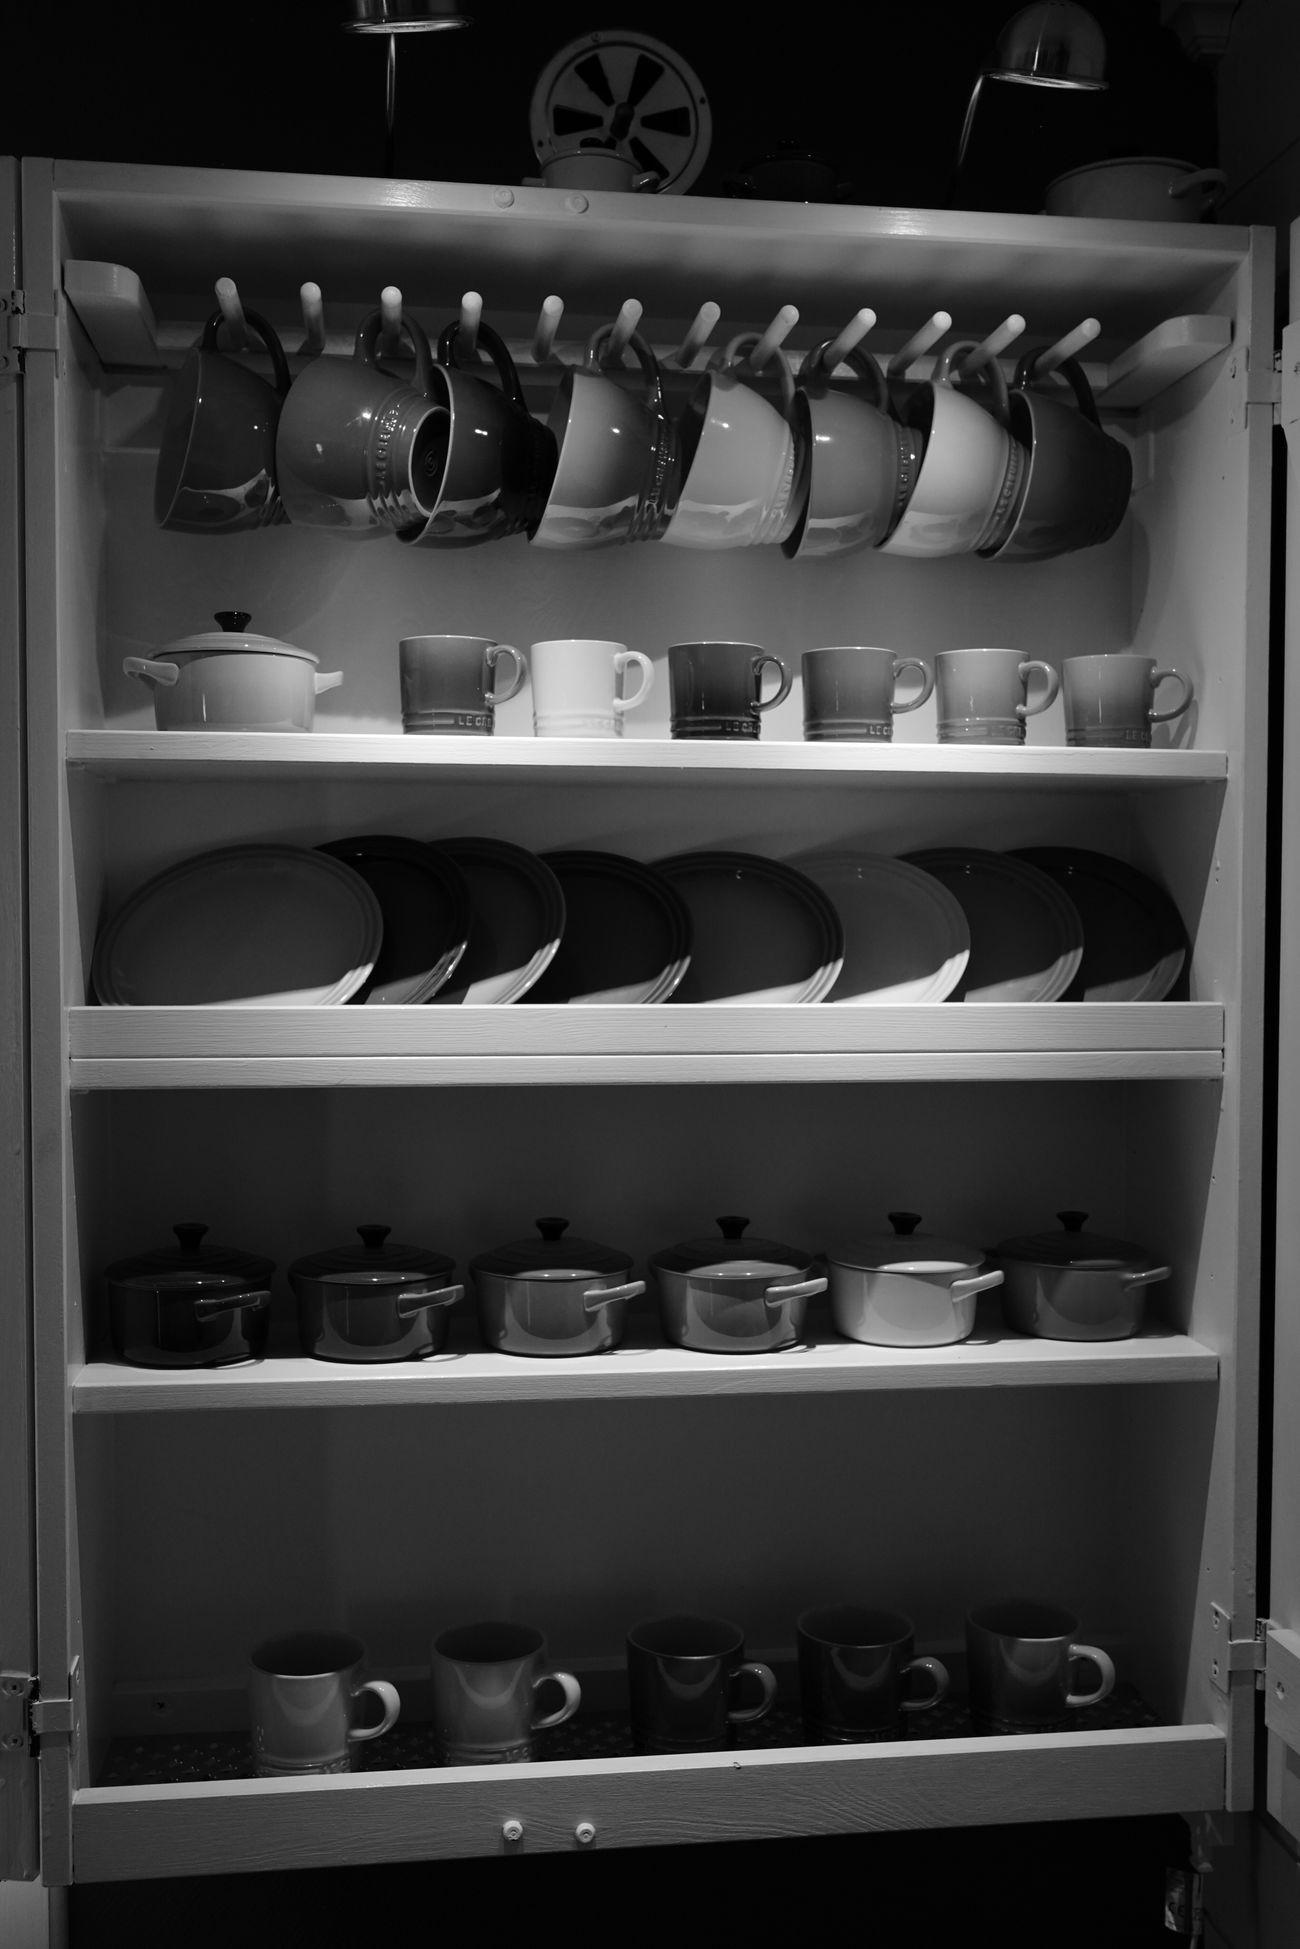 Everything In Its Place Taking Photos Monochrome EyeEm Best Shots - Black + White Blackandwhite Svartvitt Cups And Mugs Koppar Home Sweet Home A7RII Sonya7rii FE35 Bnw